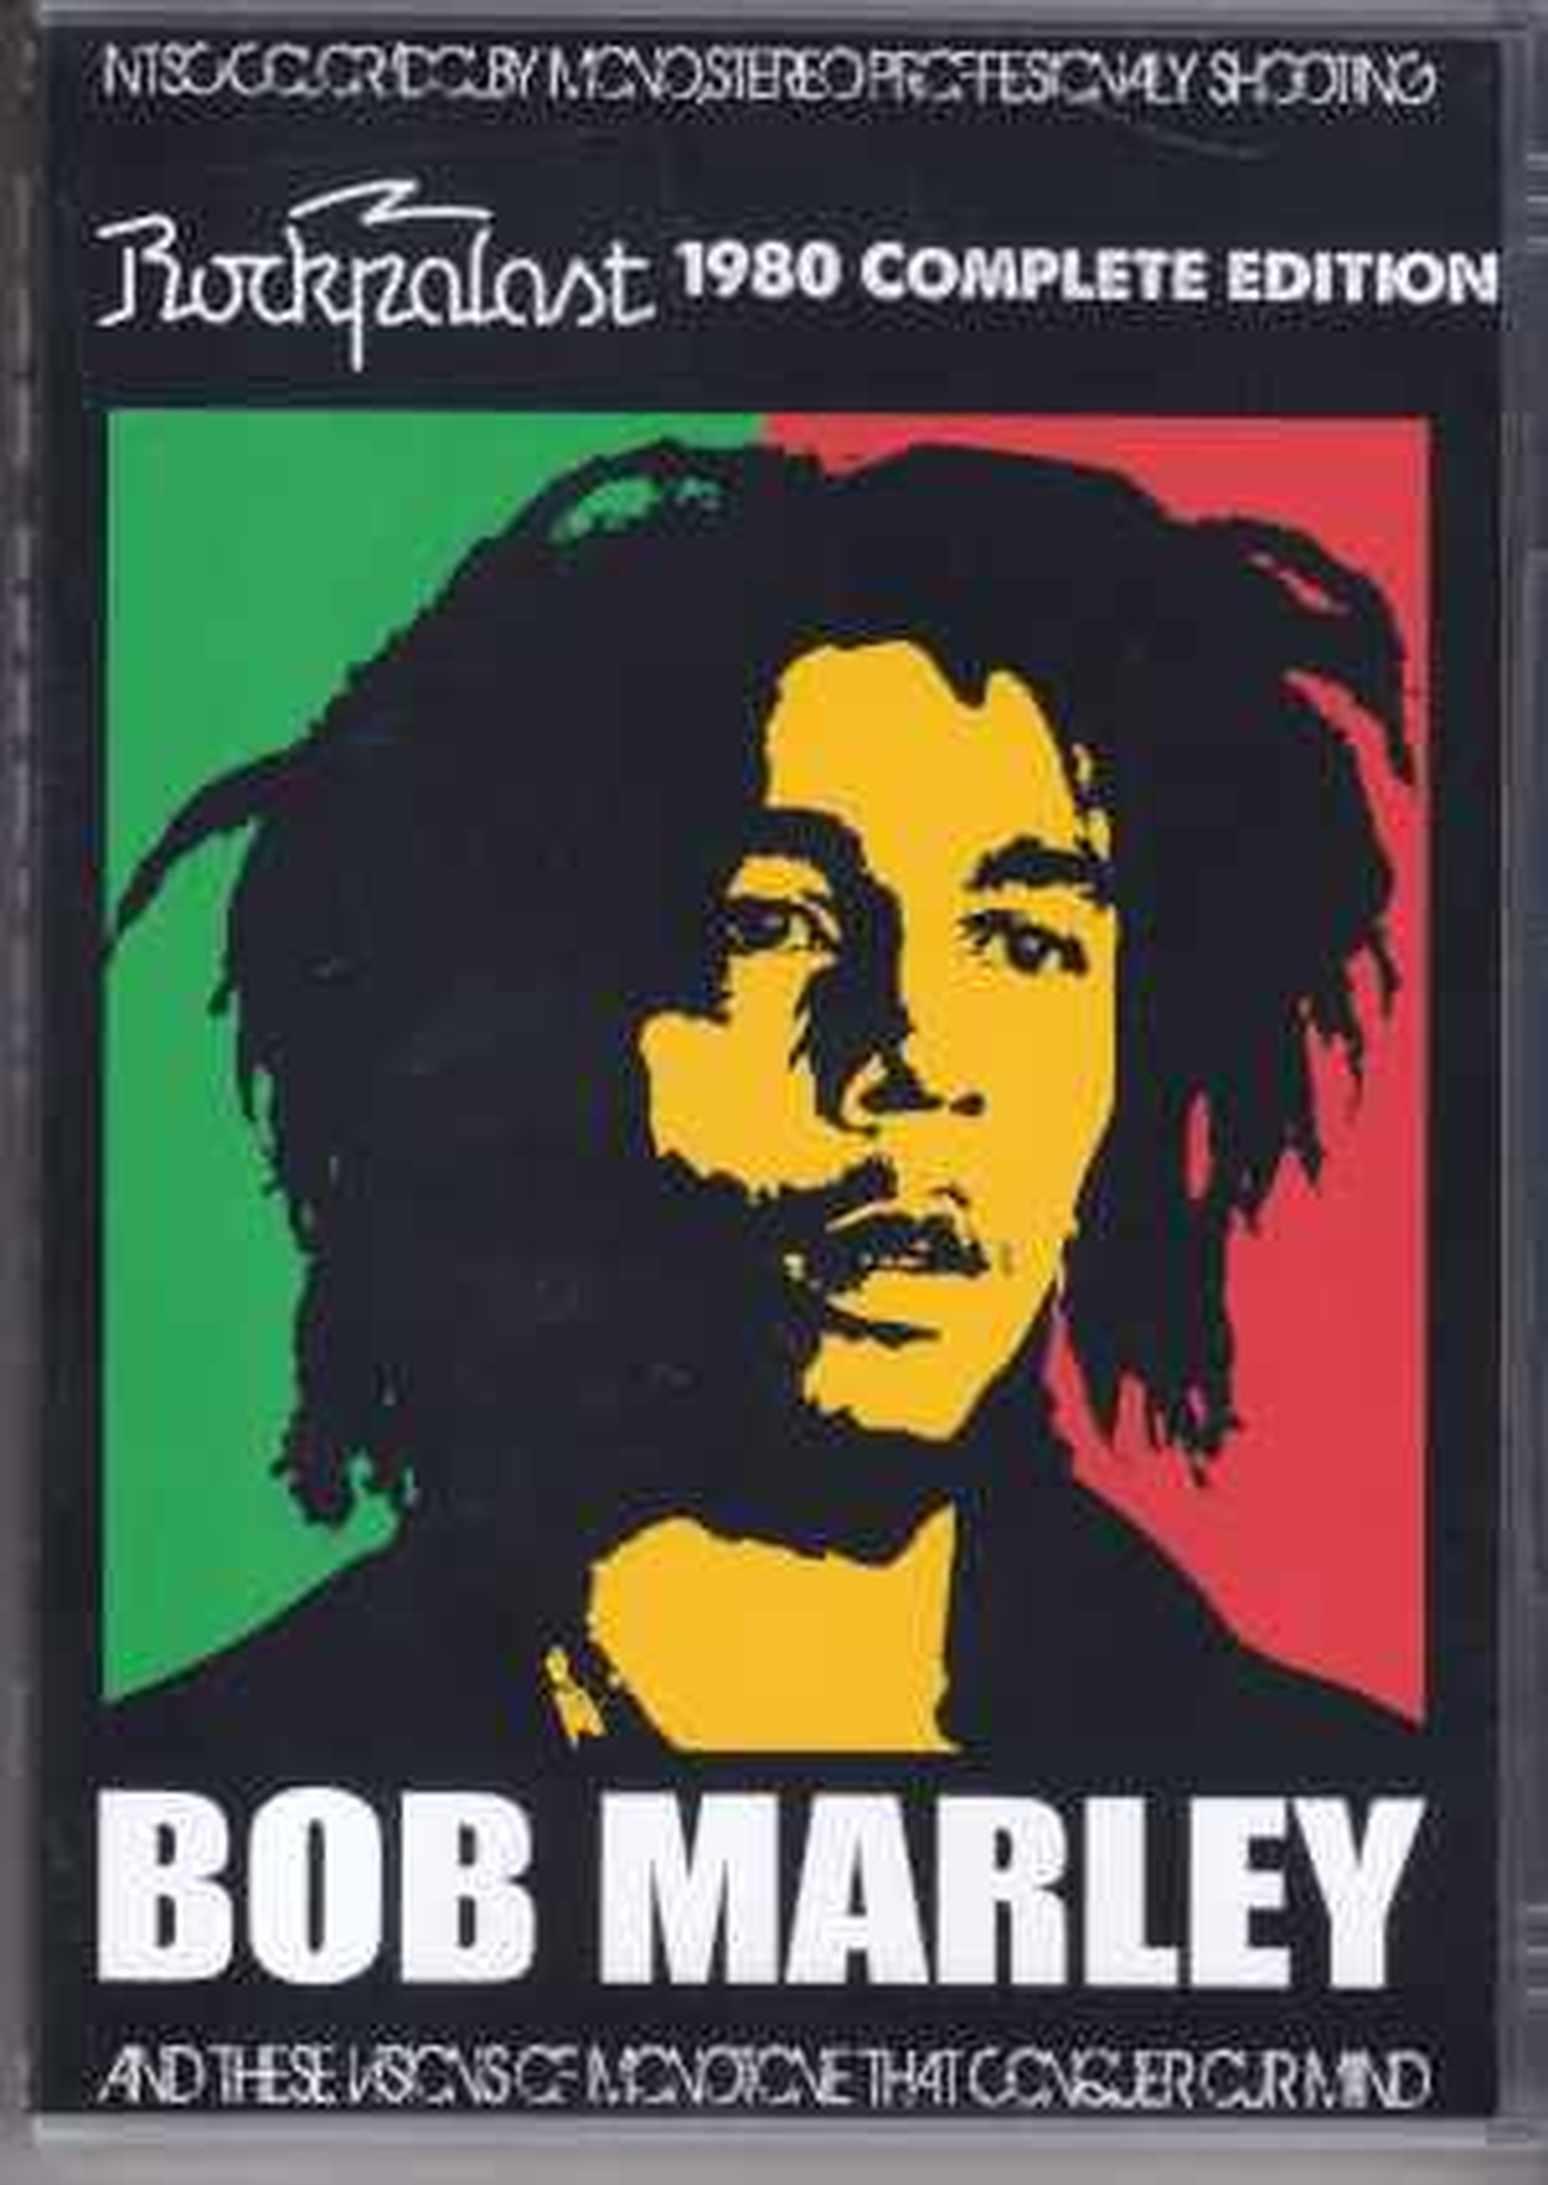 Bob Marley & the Wailers ボブ・マーレィ アンド・ザ・ウェイラーズ/Germany 1980